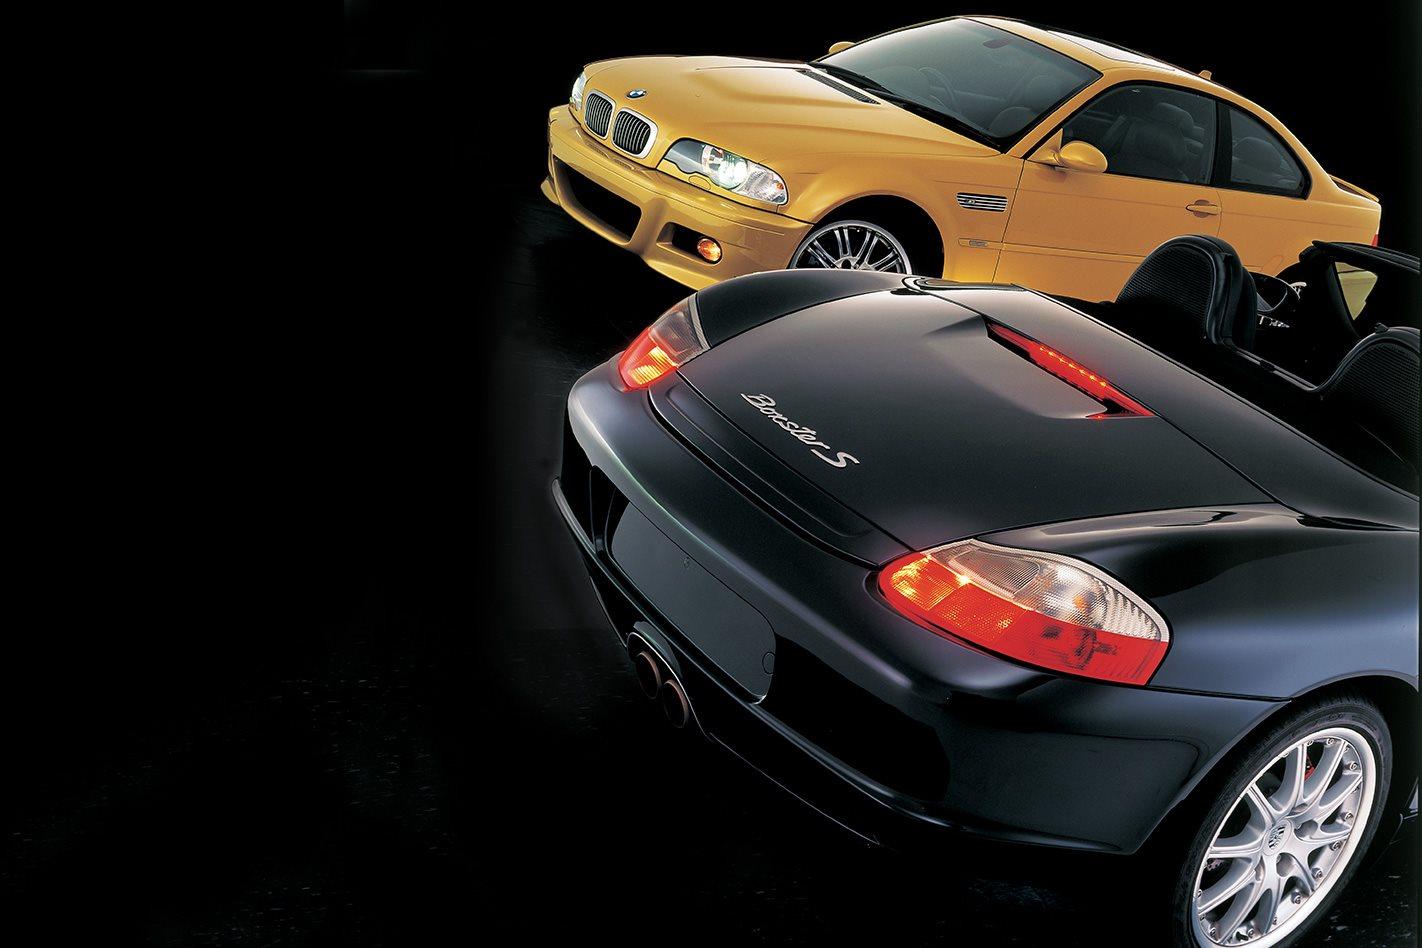 2003 BMW M3 vs 2003 Porsche Boxster S